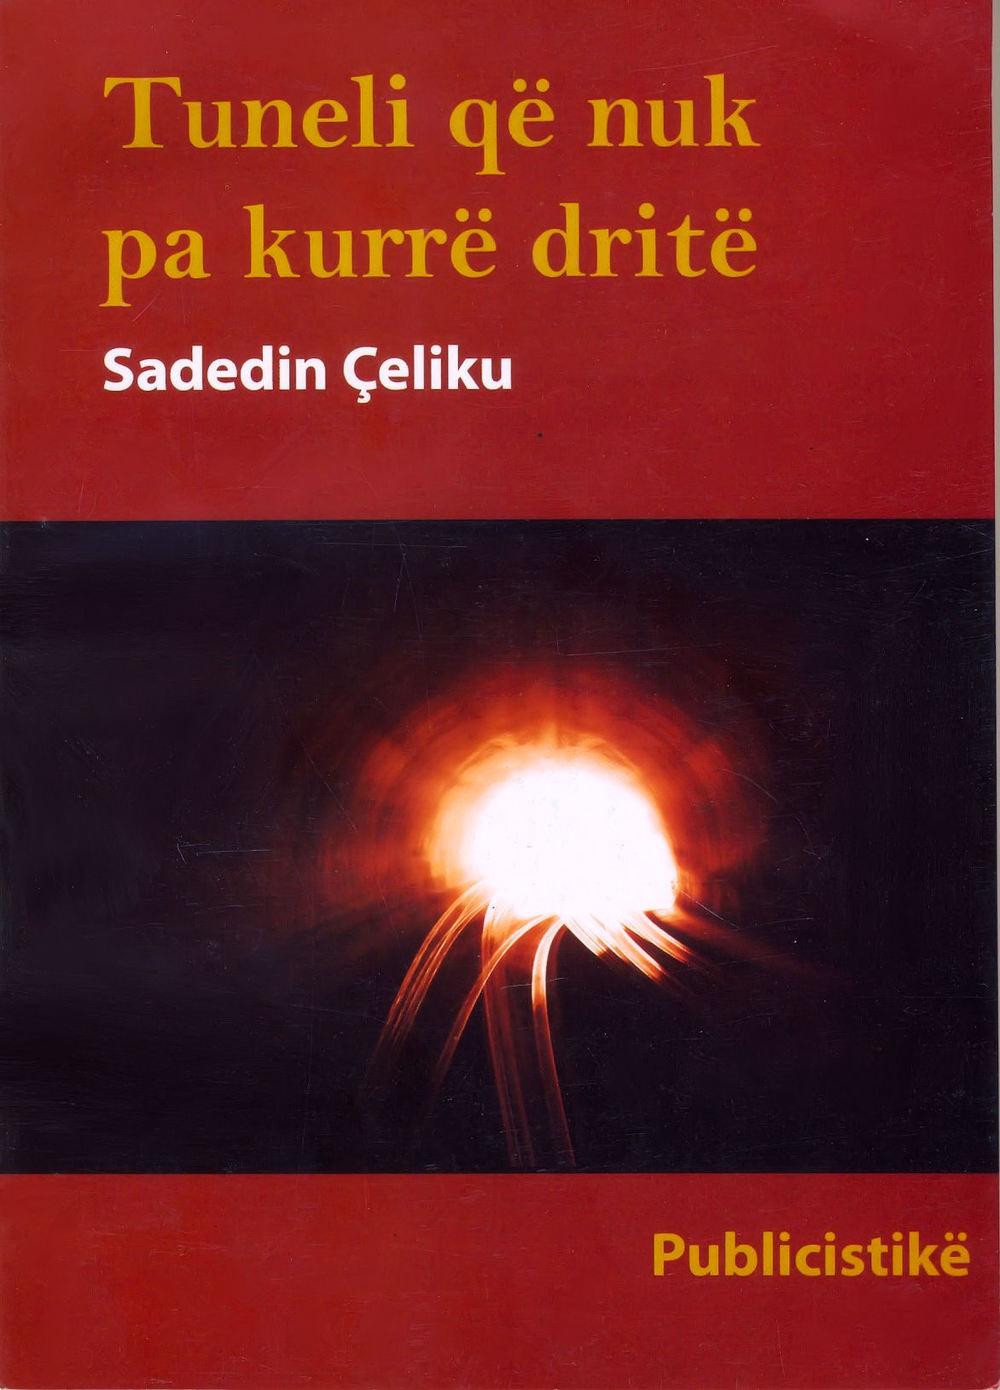 book 1 (front).jpg